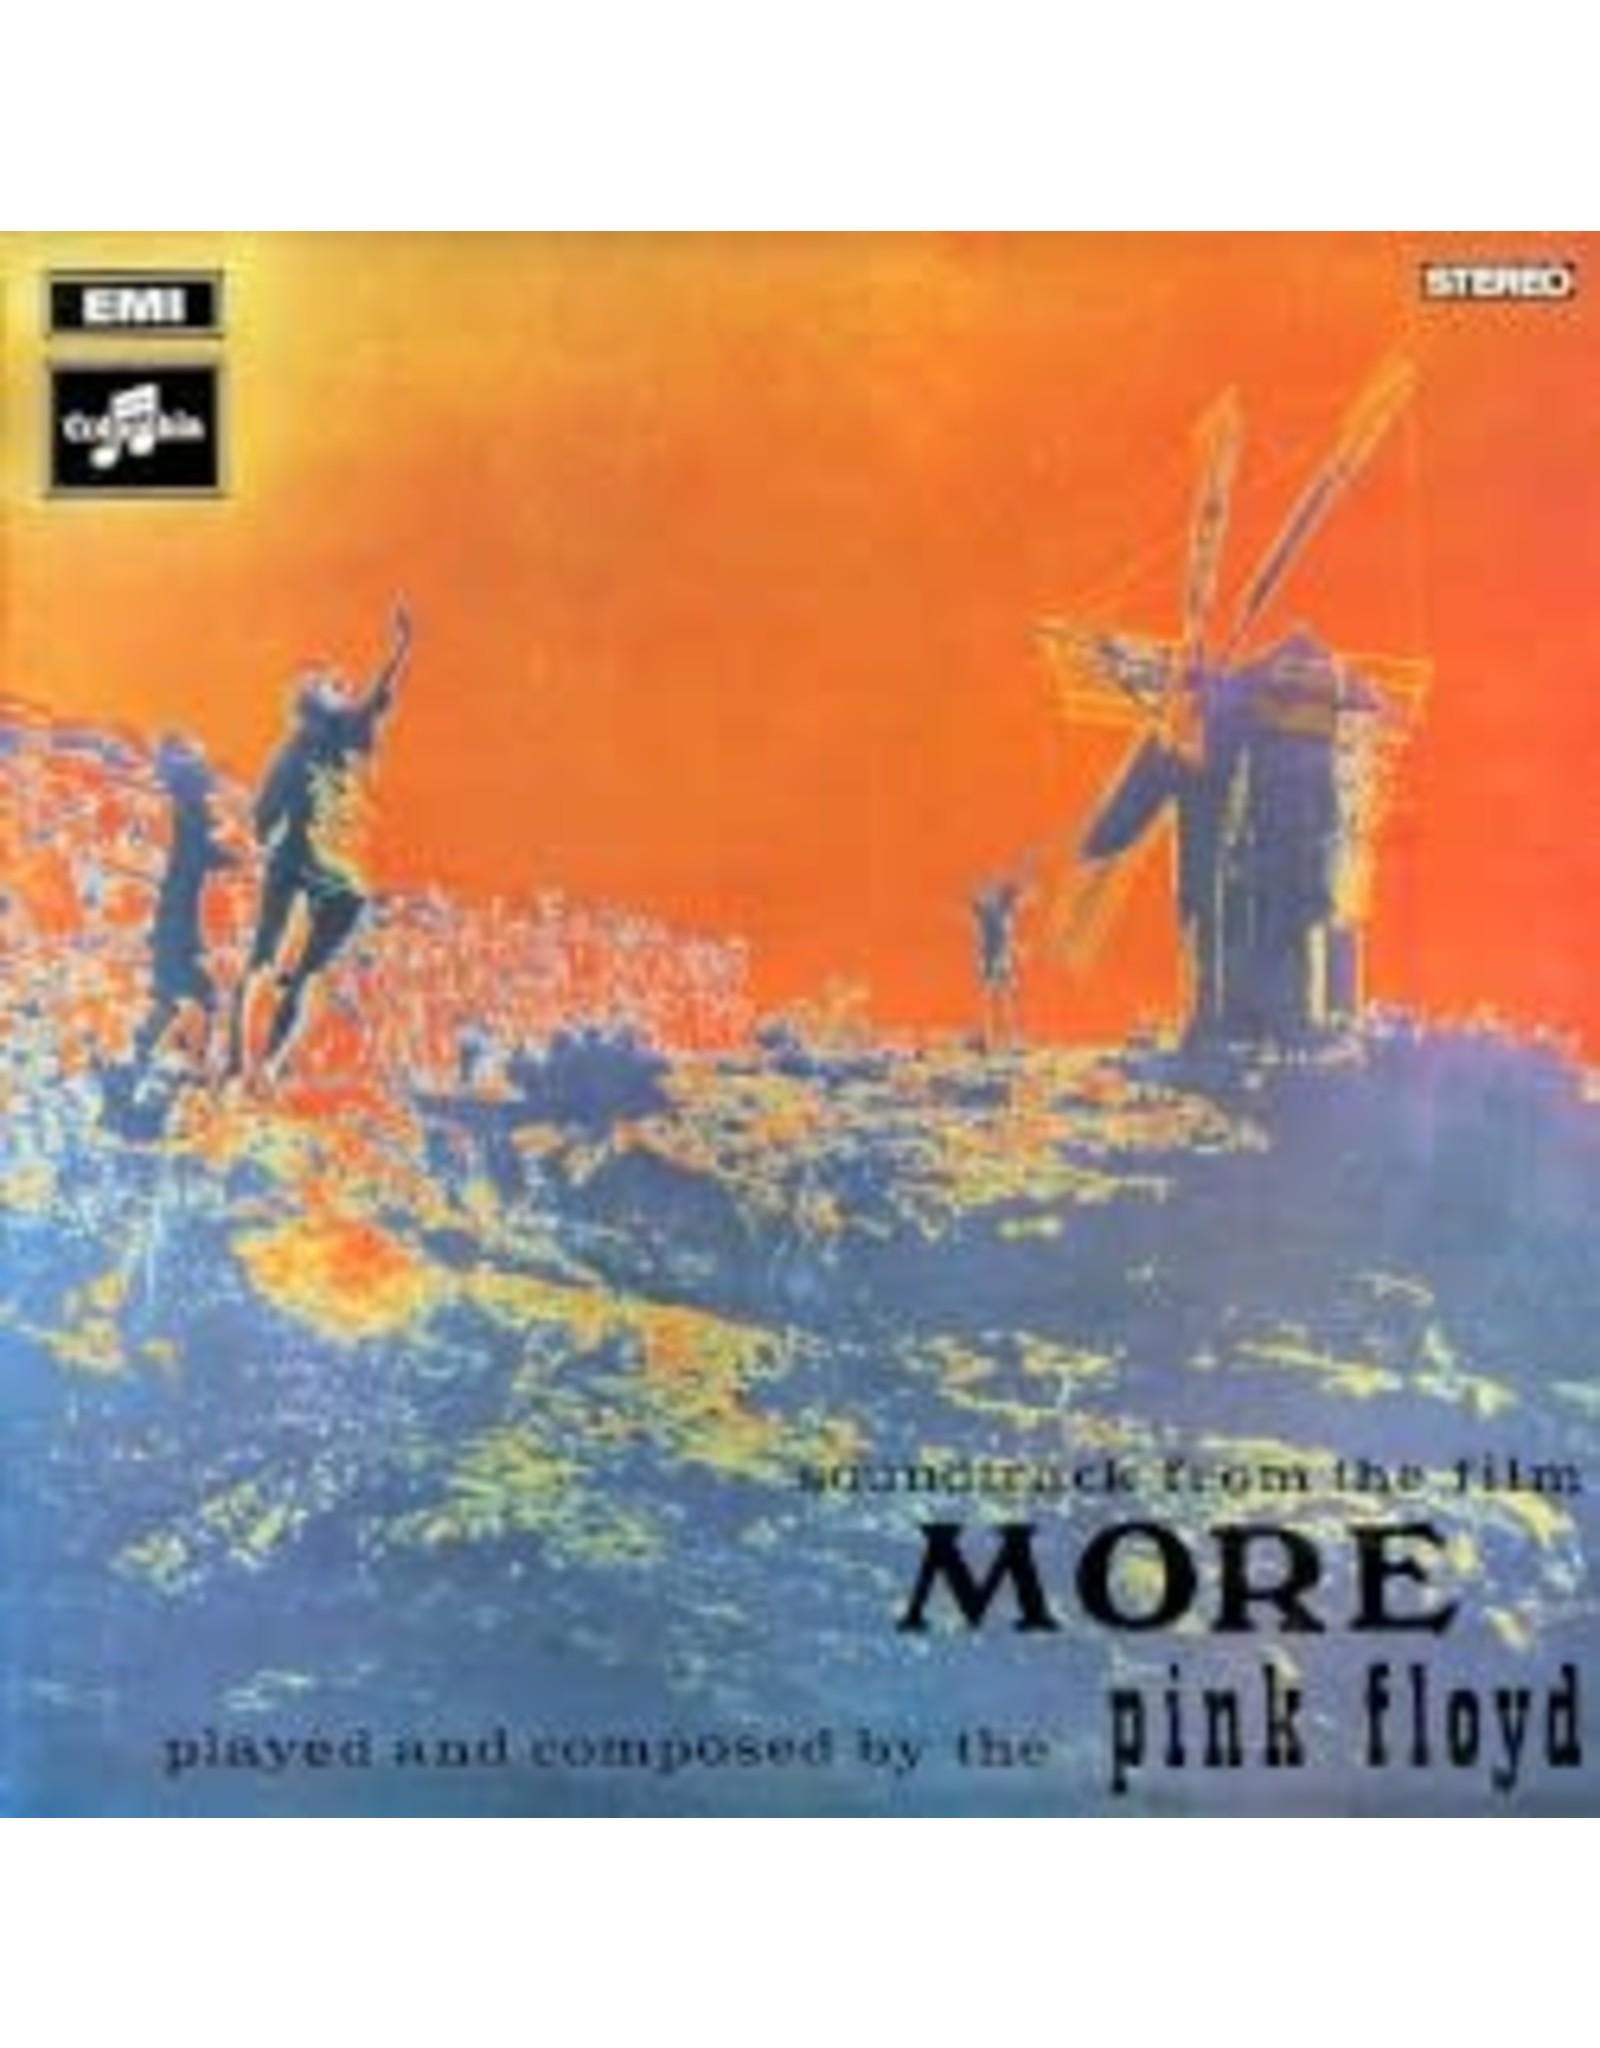 Pink Floyd - More (Sountrack) LP